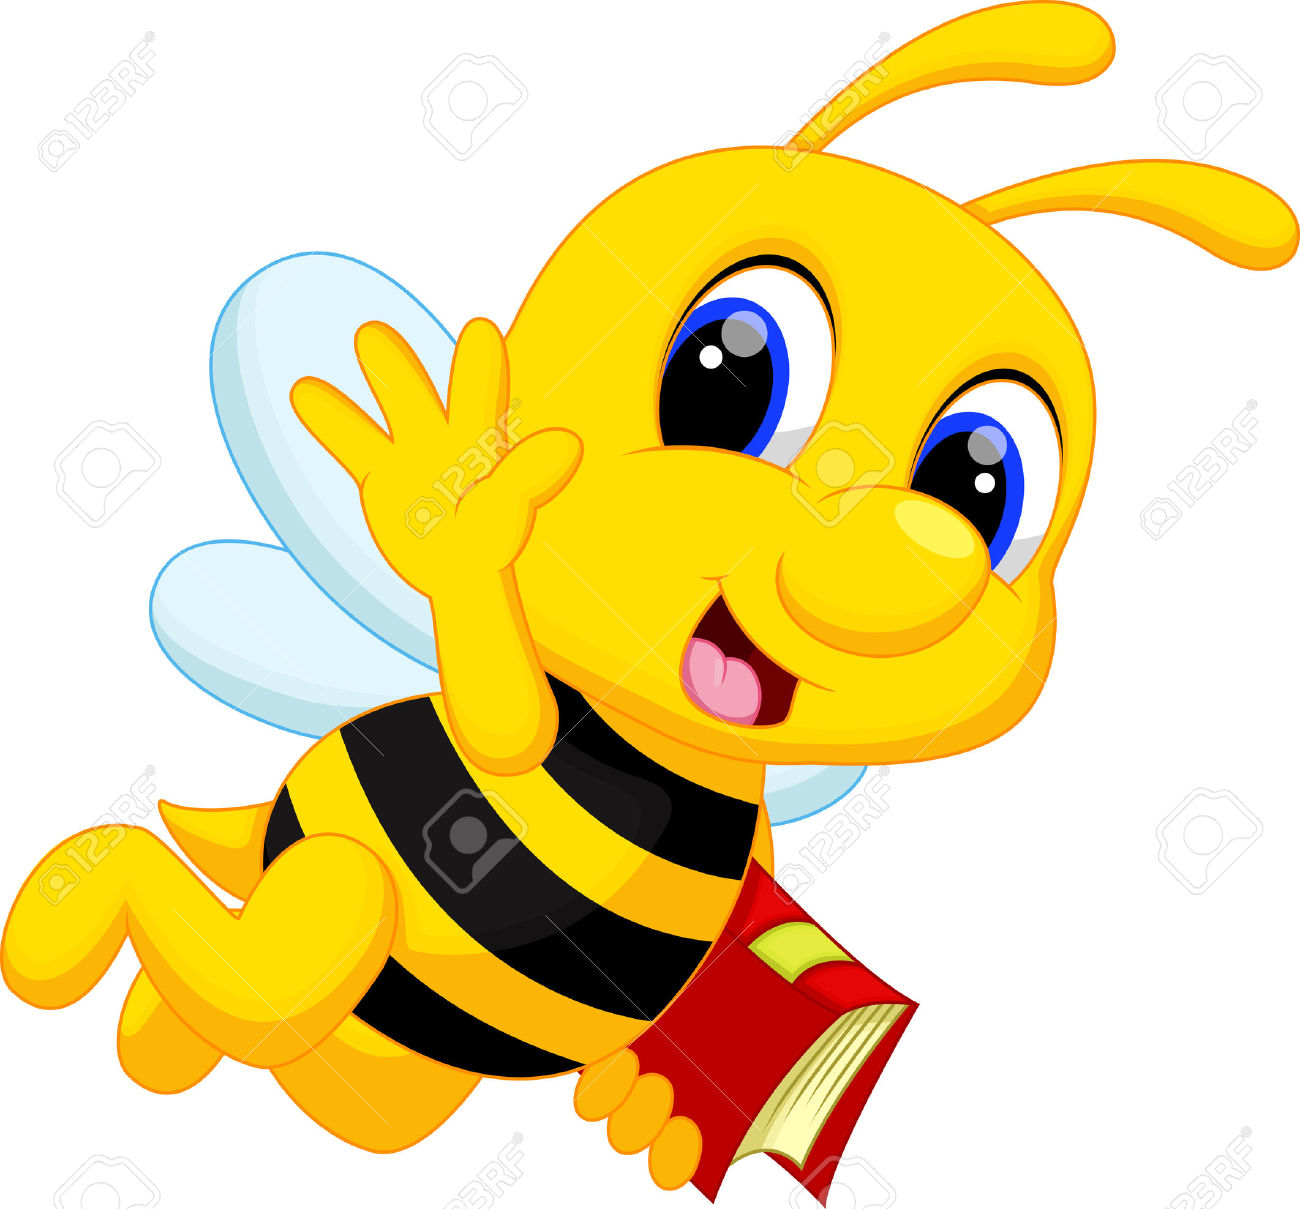 Image abeille clipart 6 » Clipart Station.